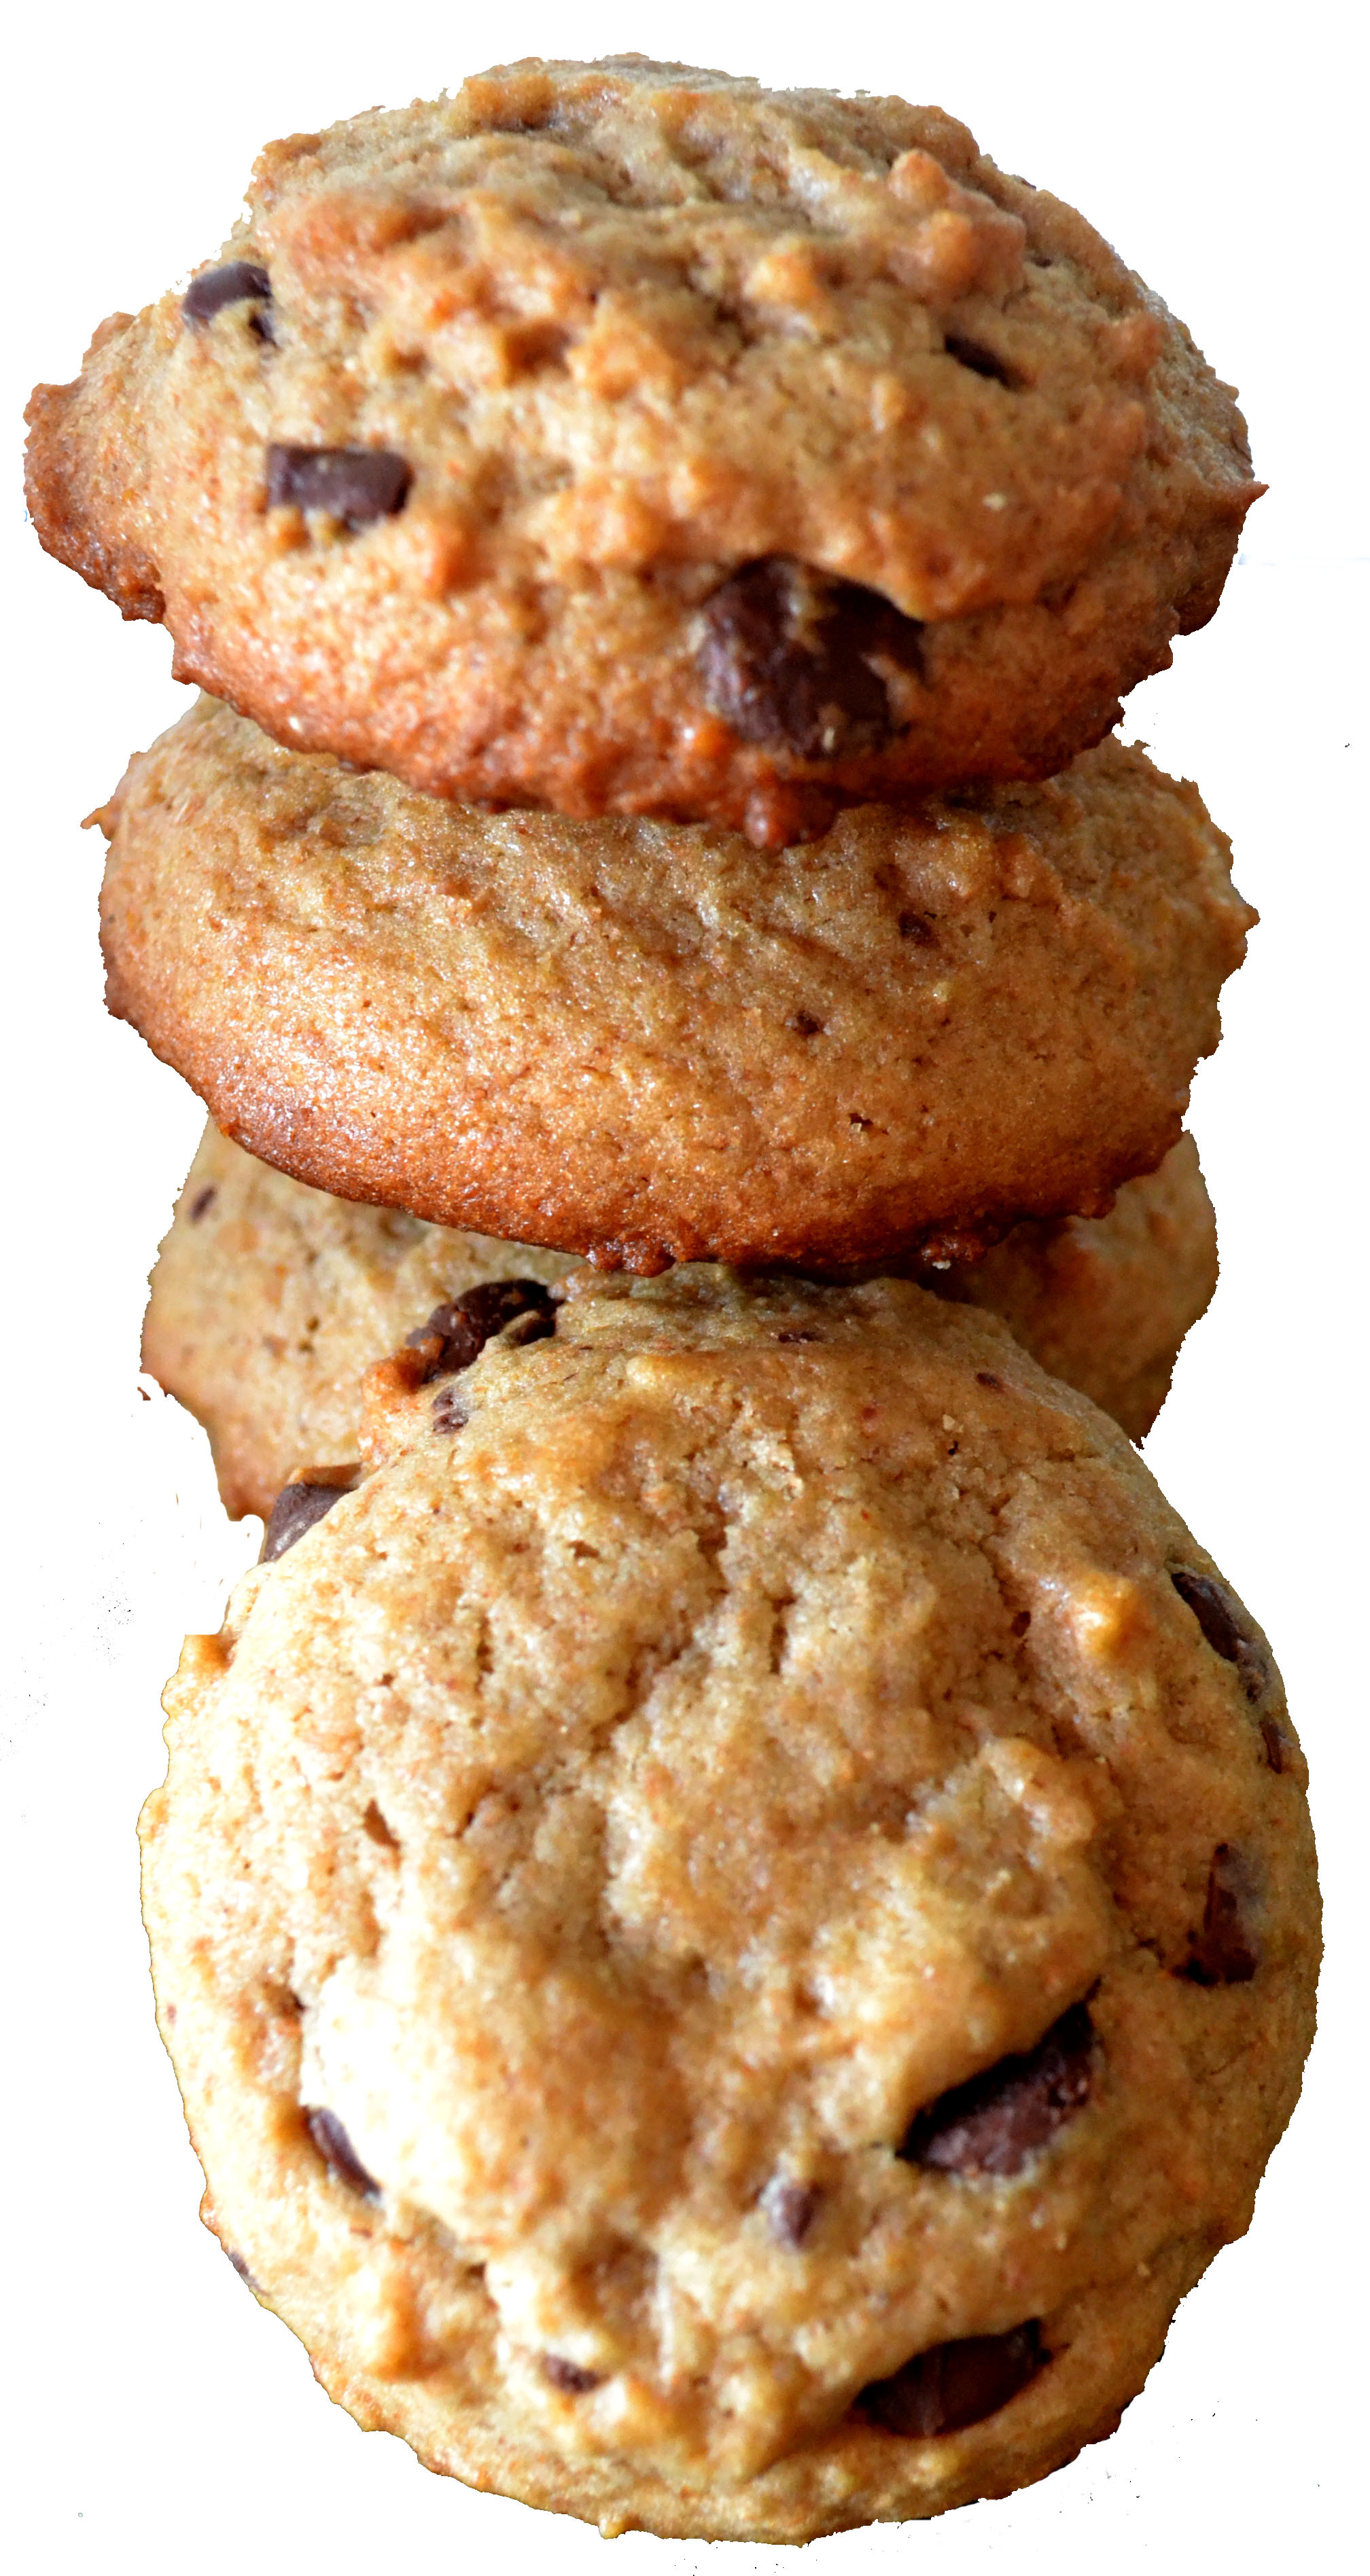 Sugar Free Chocolate Chip Cookies  Battle of the Chocolate Chip Cookie – Low Sugar vs Toll